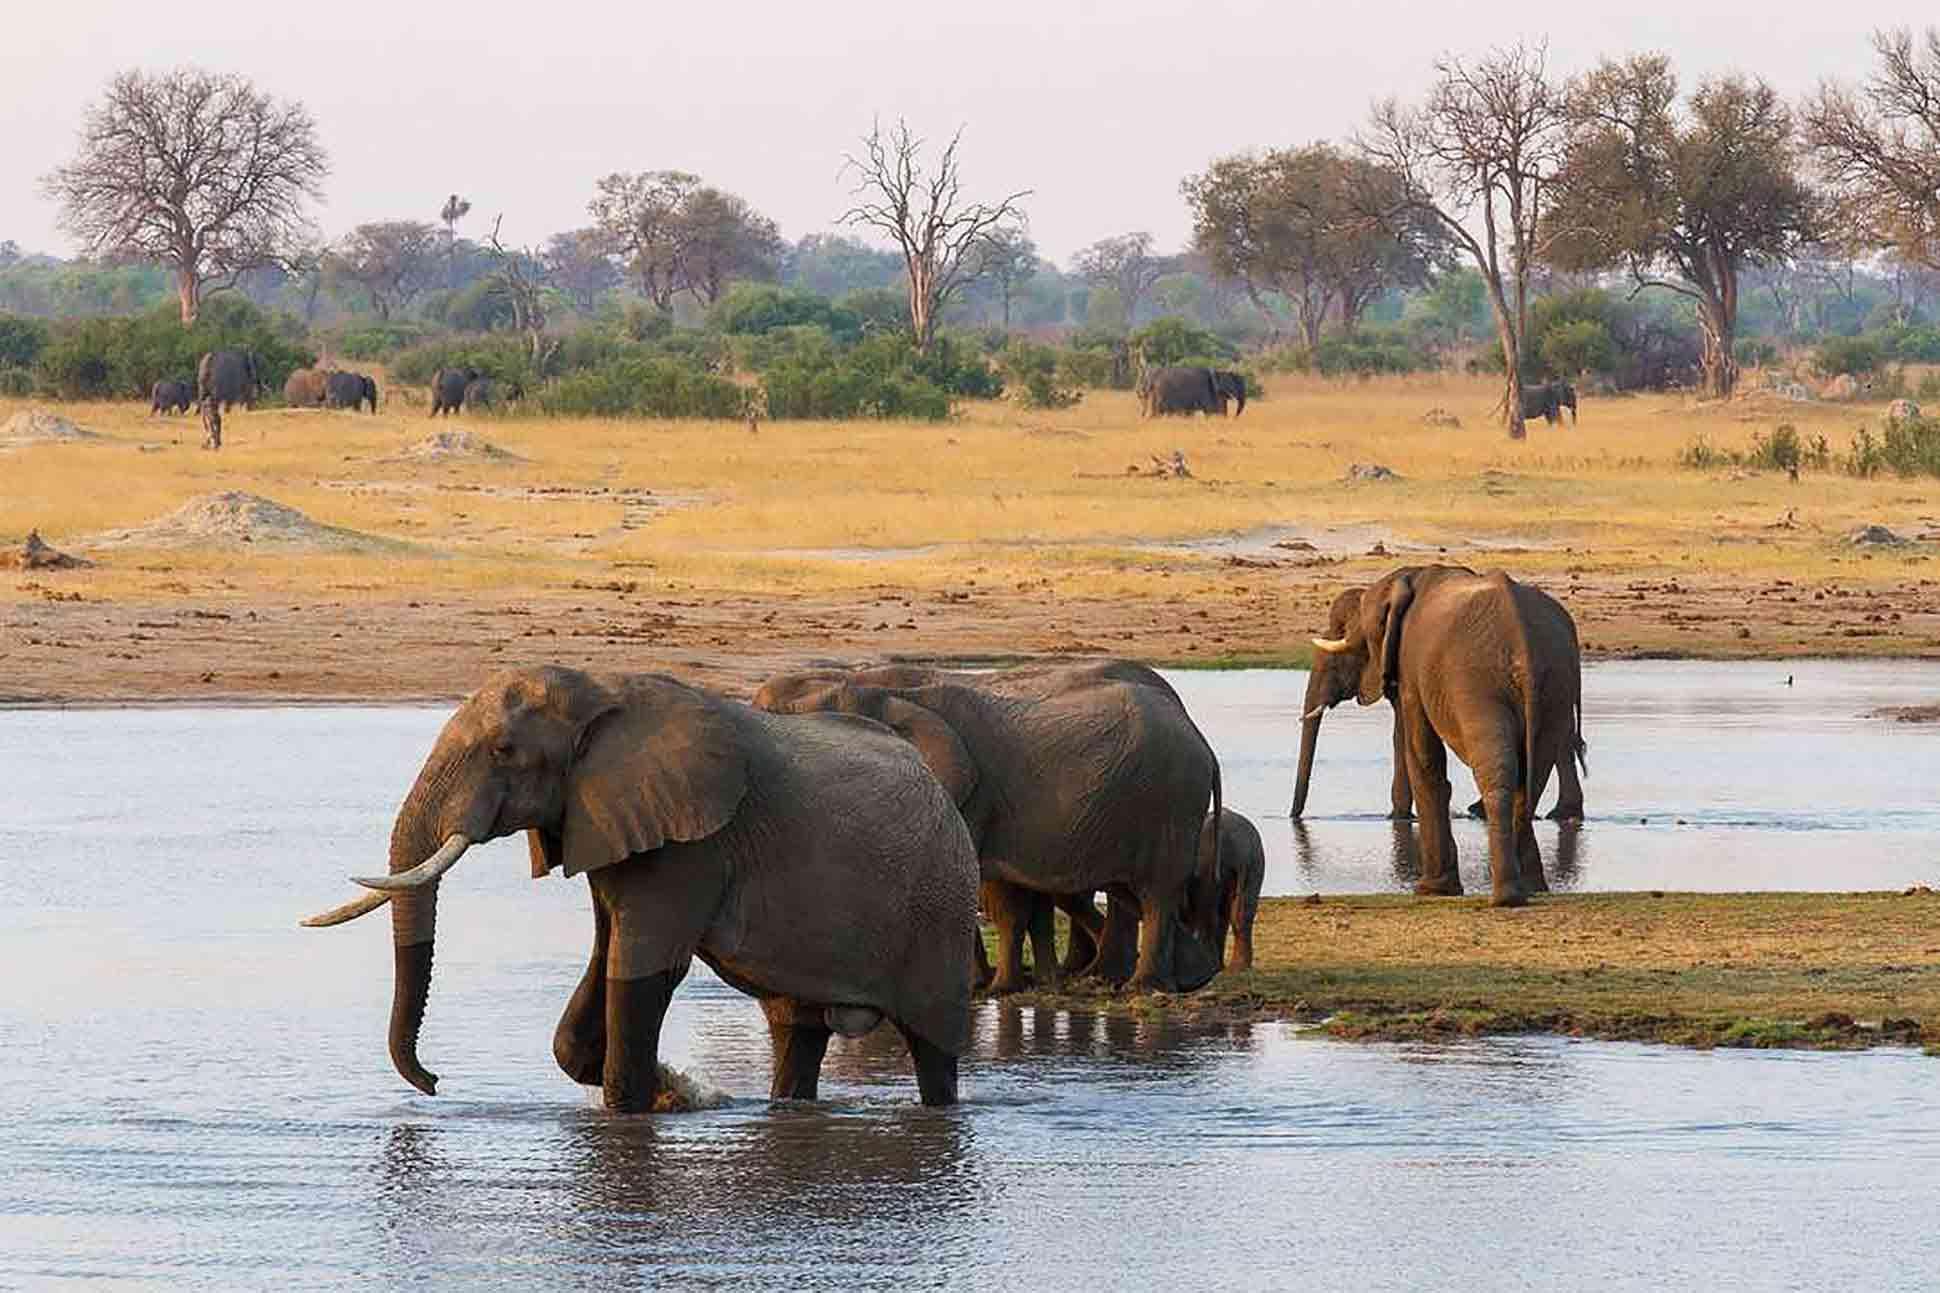 Elephants bathe in Hwange National Park, Zimbabwe, Africa. Photography by Sarah Kerr, courtesy of Wilderness Safaris